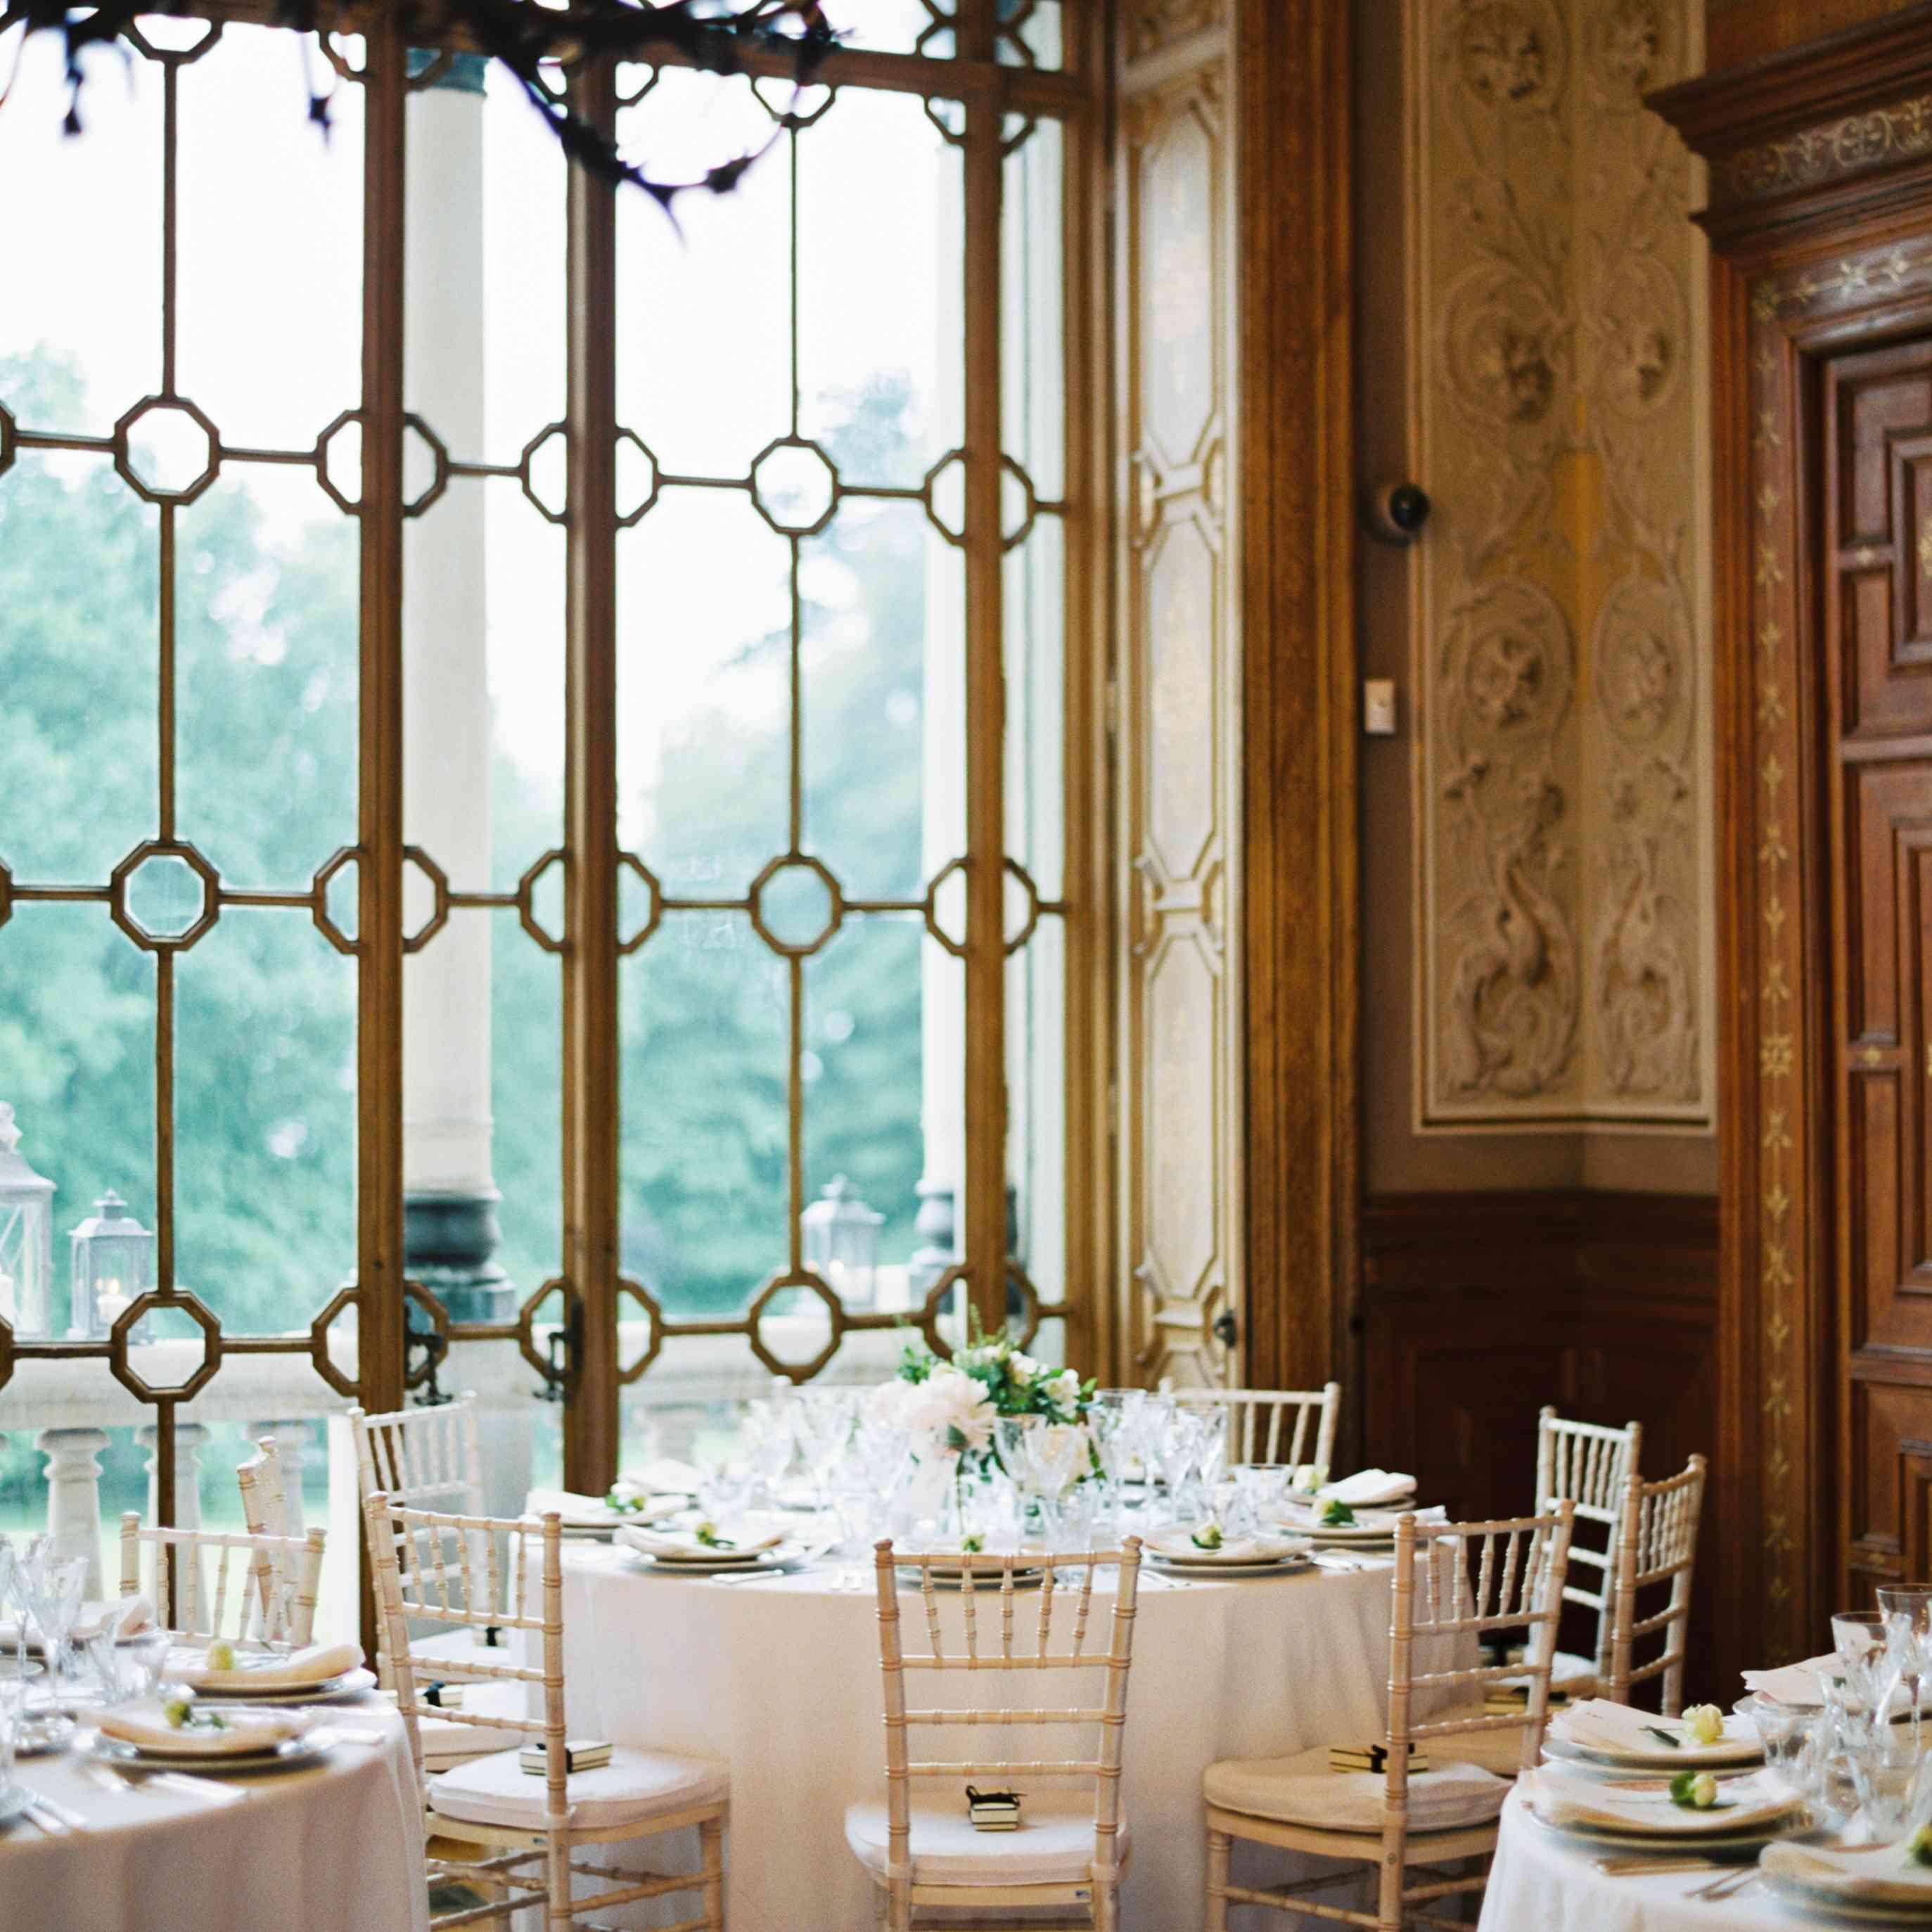 Northern Italian Wedding, Reception Tables